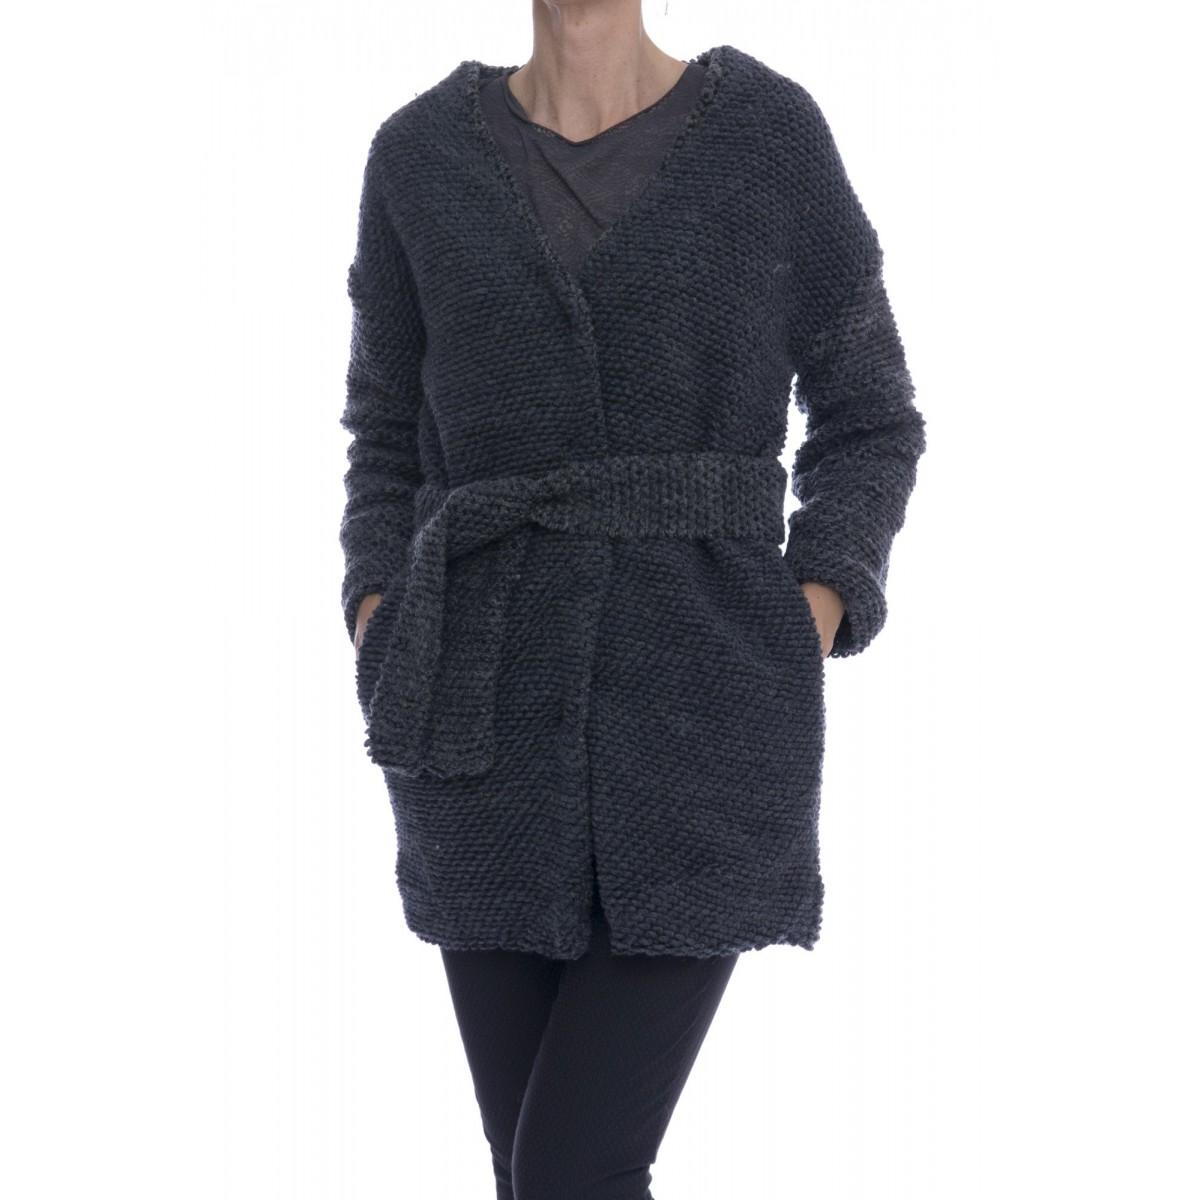 Pantalone donna 40 weft - Yole 9259 maglia giacca